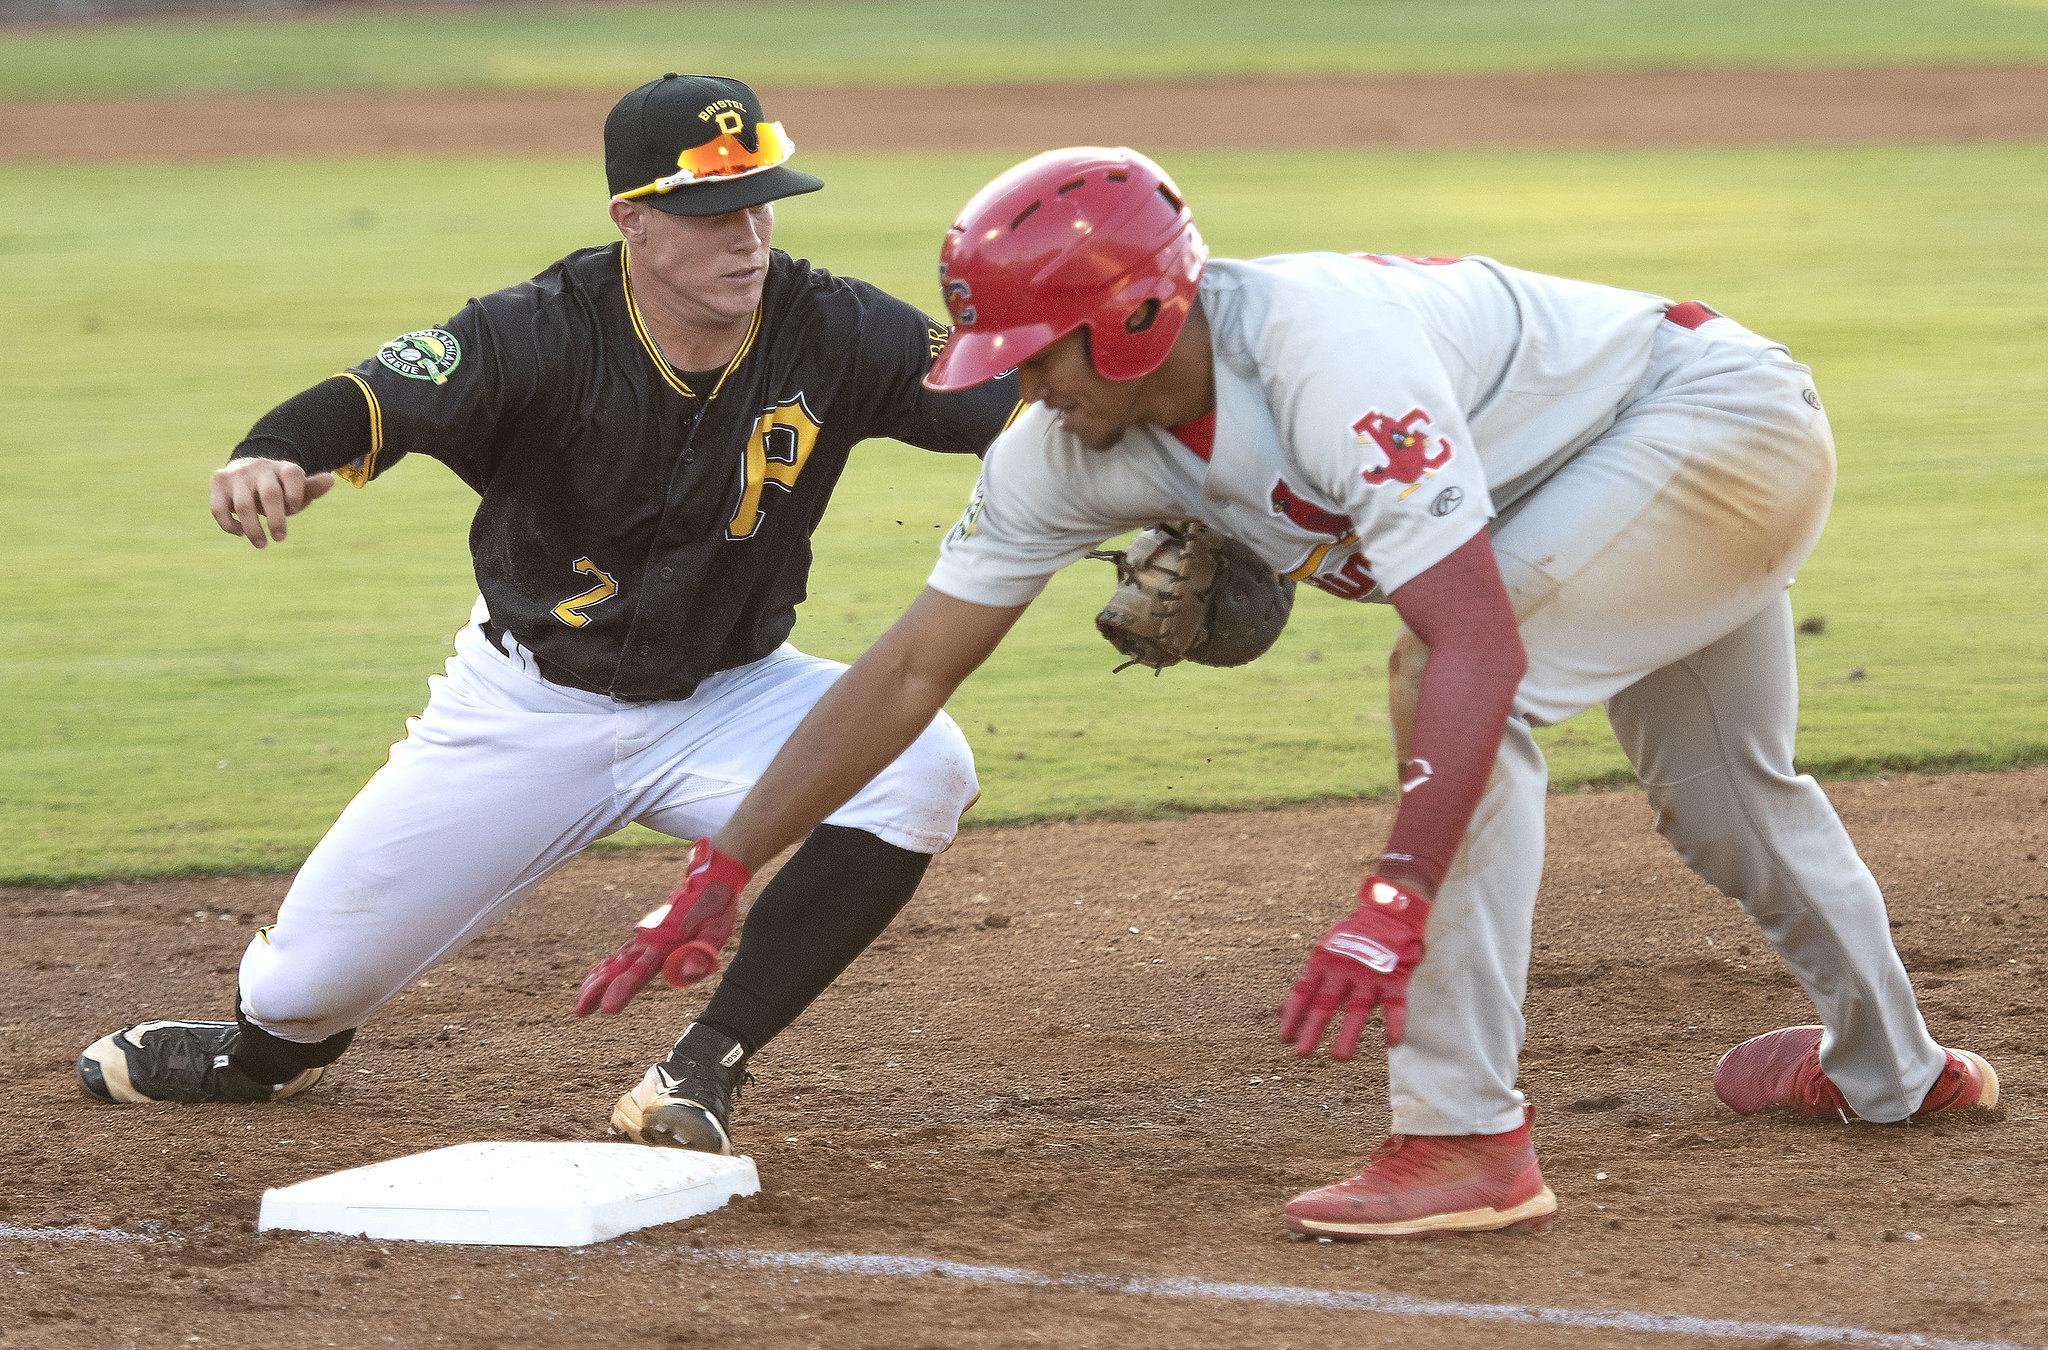 Pirates vs Cardinals Baseball